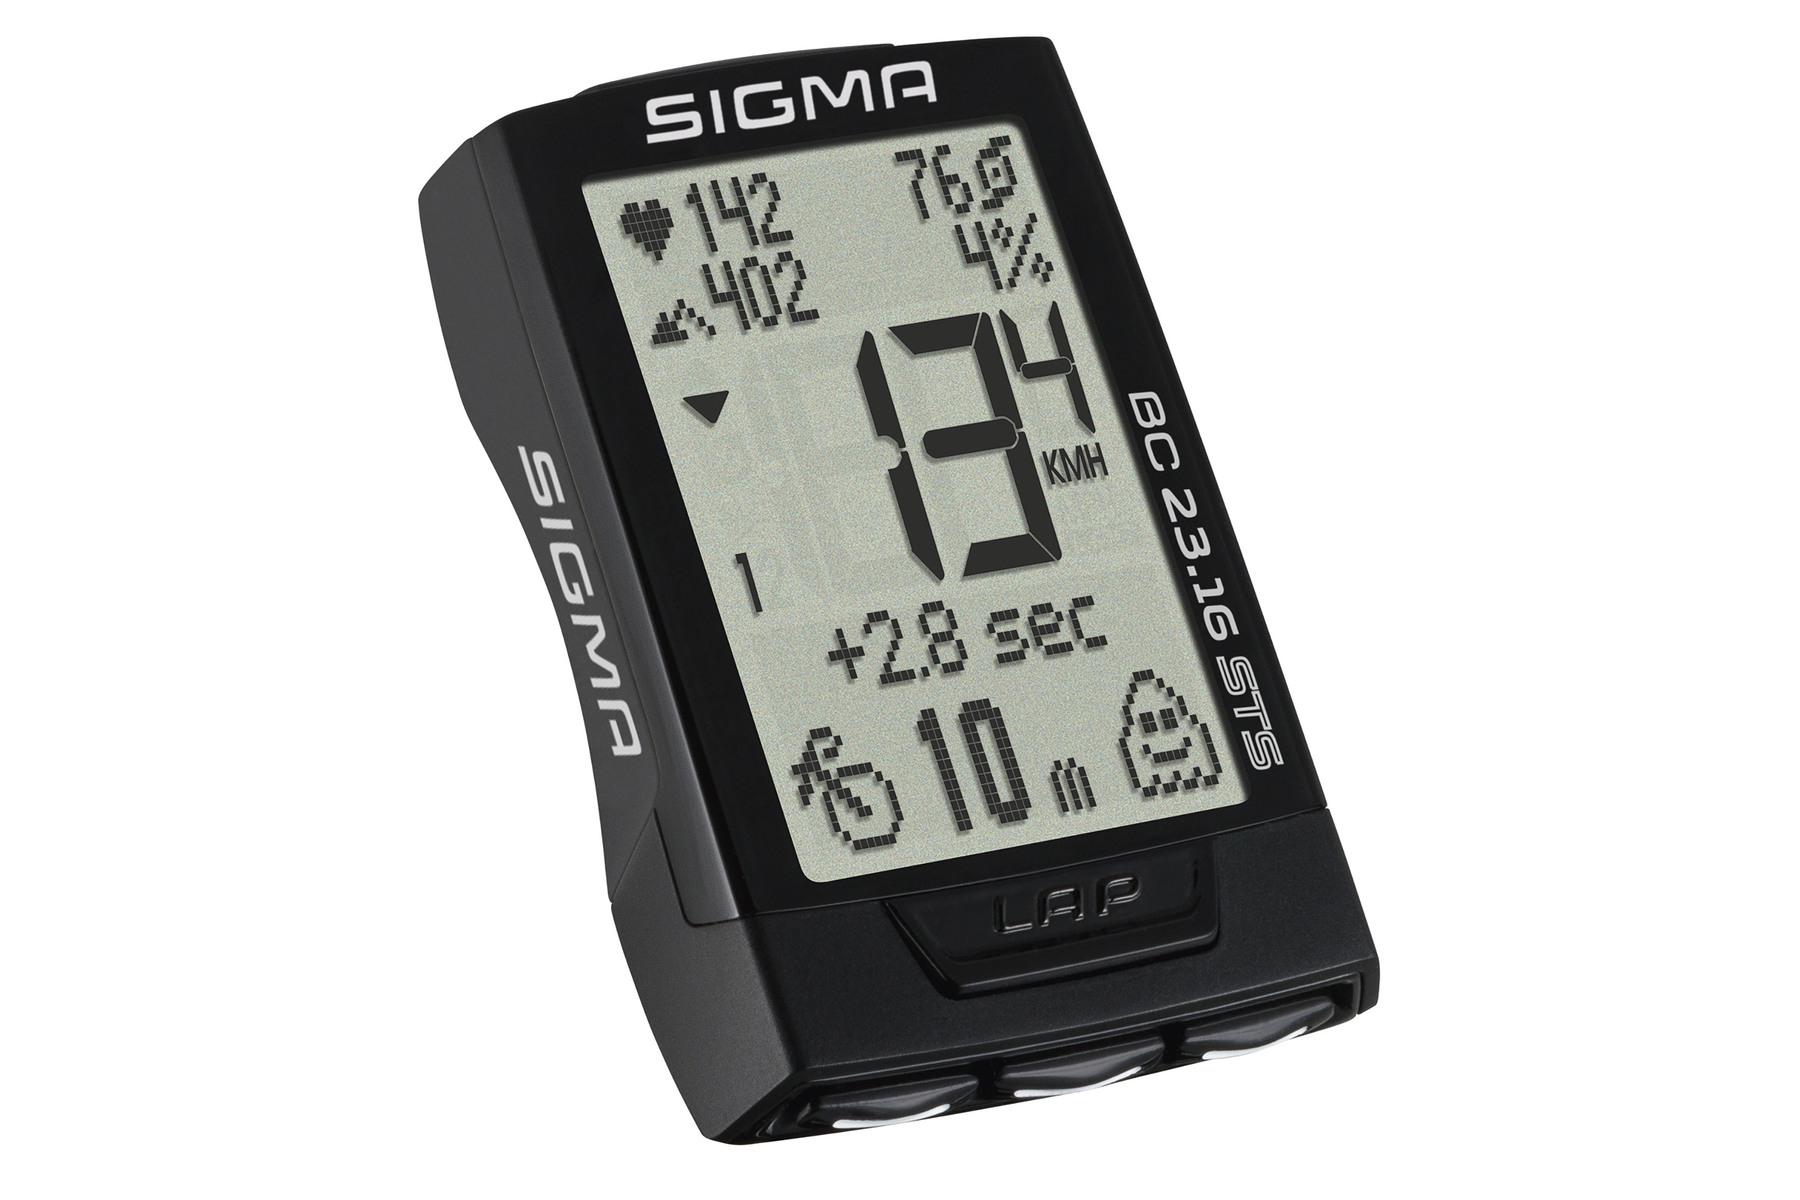 Sigma BC 23.16 STS Fahrradcomputer -kabellos-